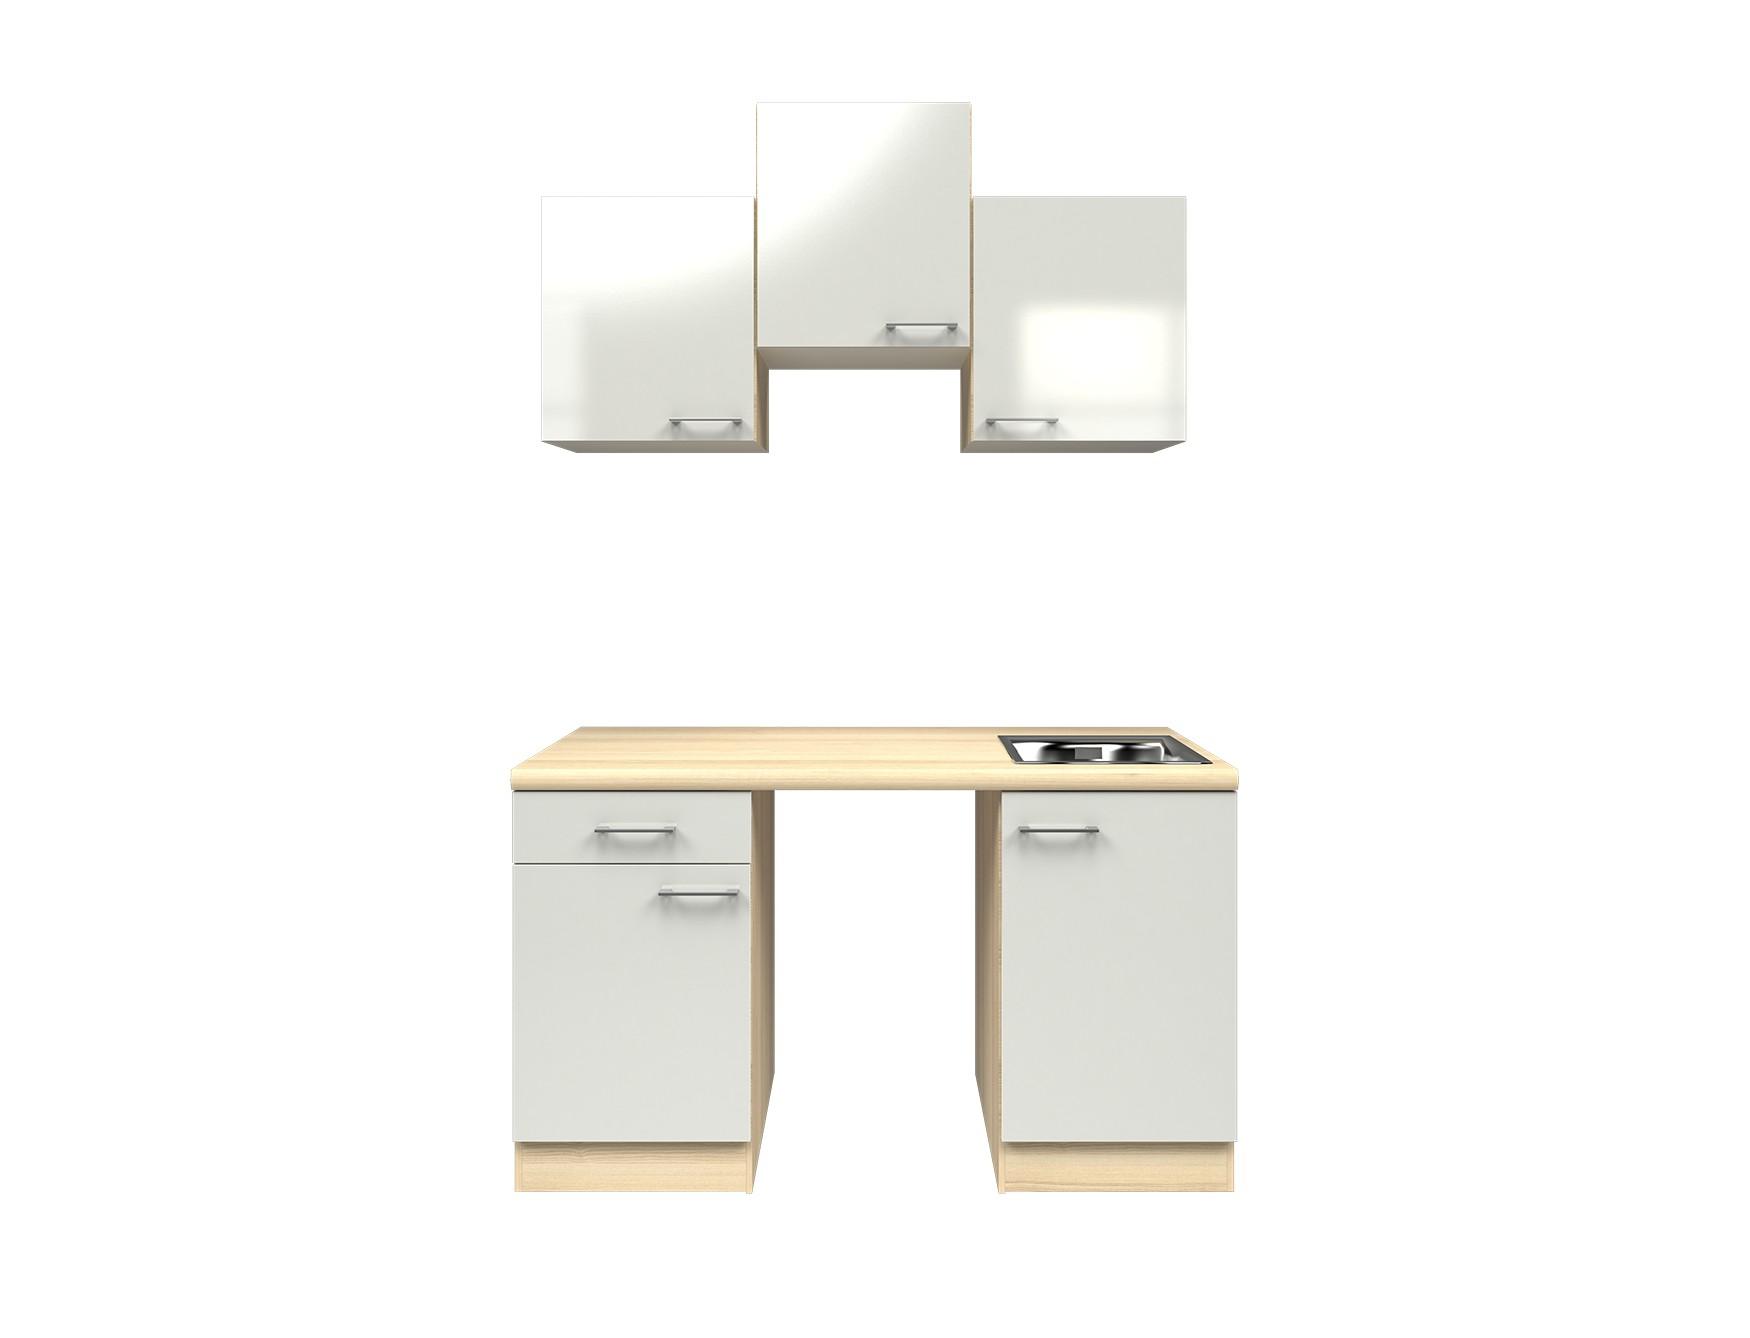 singlek che florenz k chen leerblock breite 150 cm perlmutt wei k che singlek chen. Black Bedroom Furniture Sets. Home Design Ideas